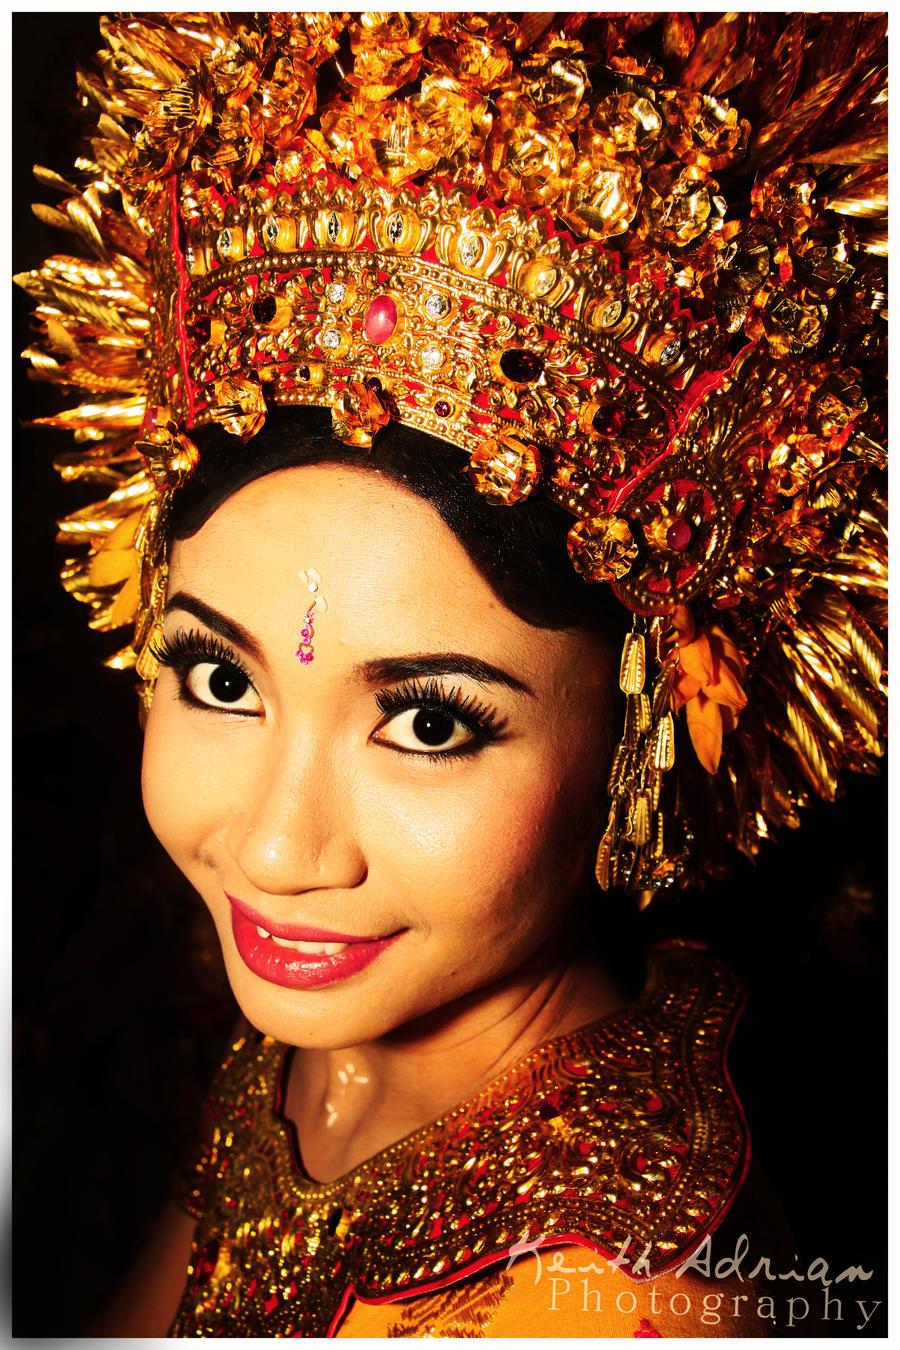 Balinese girlfriend